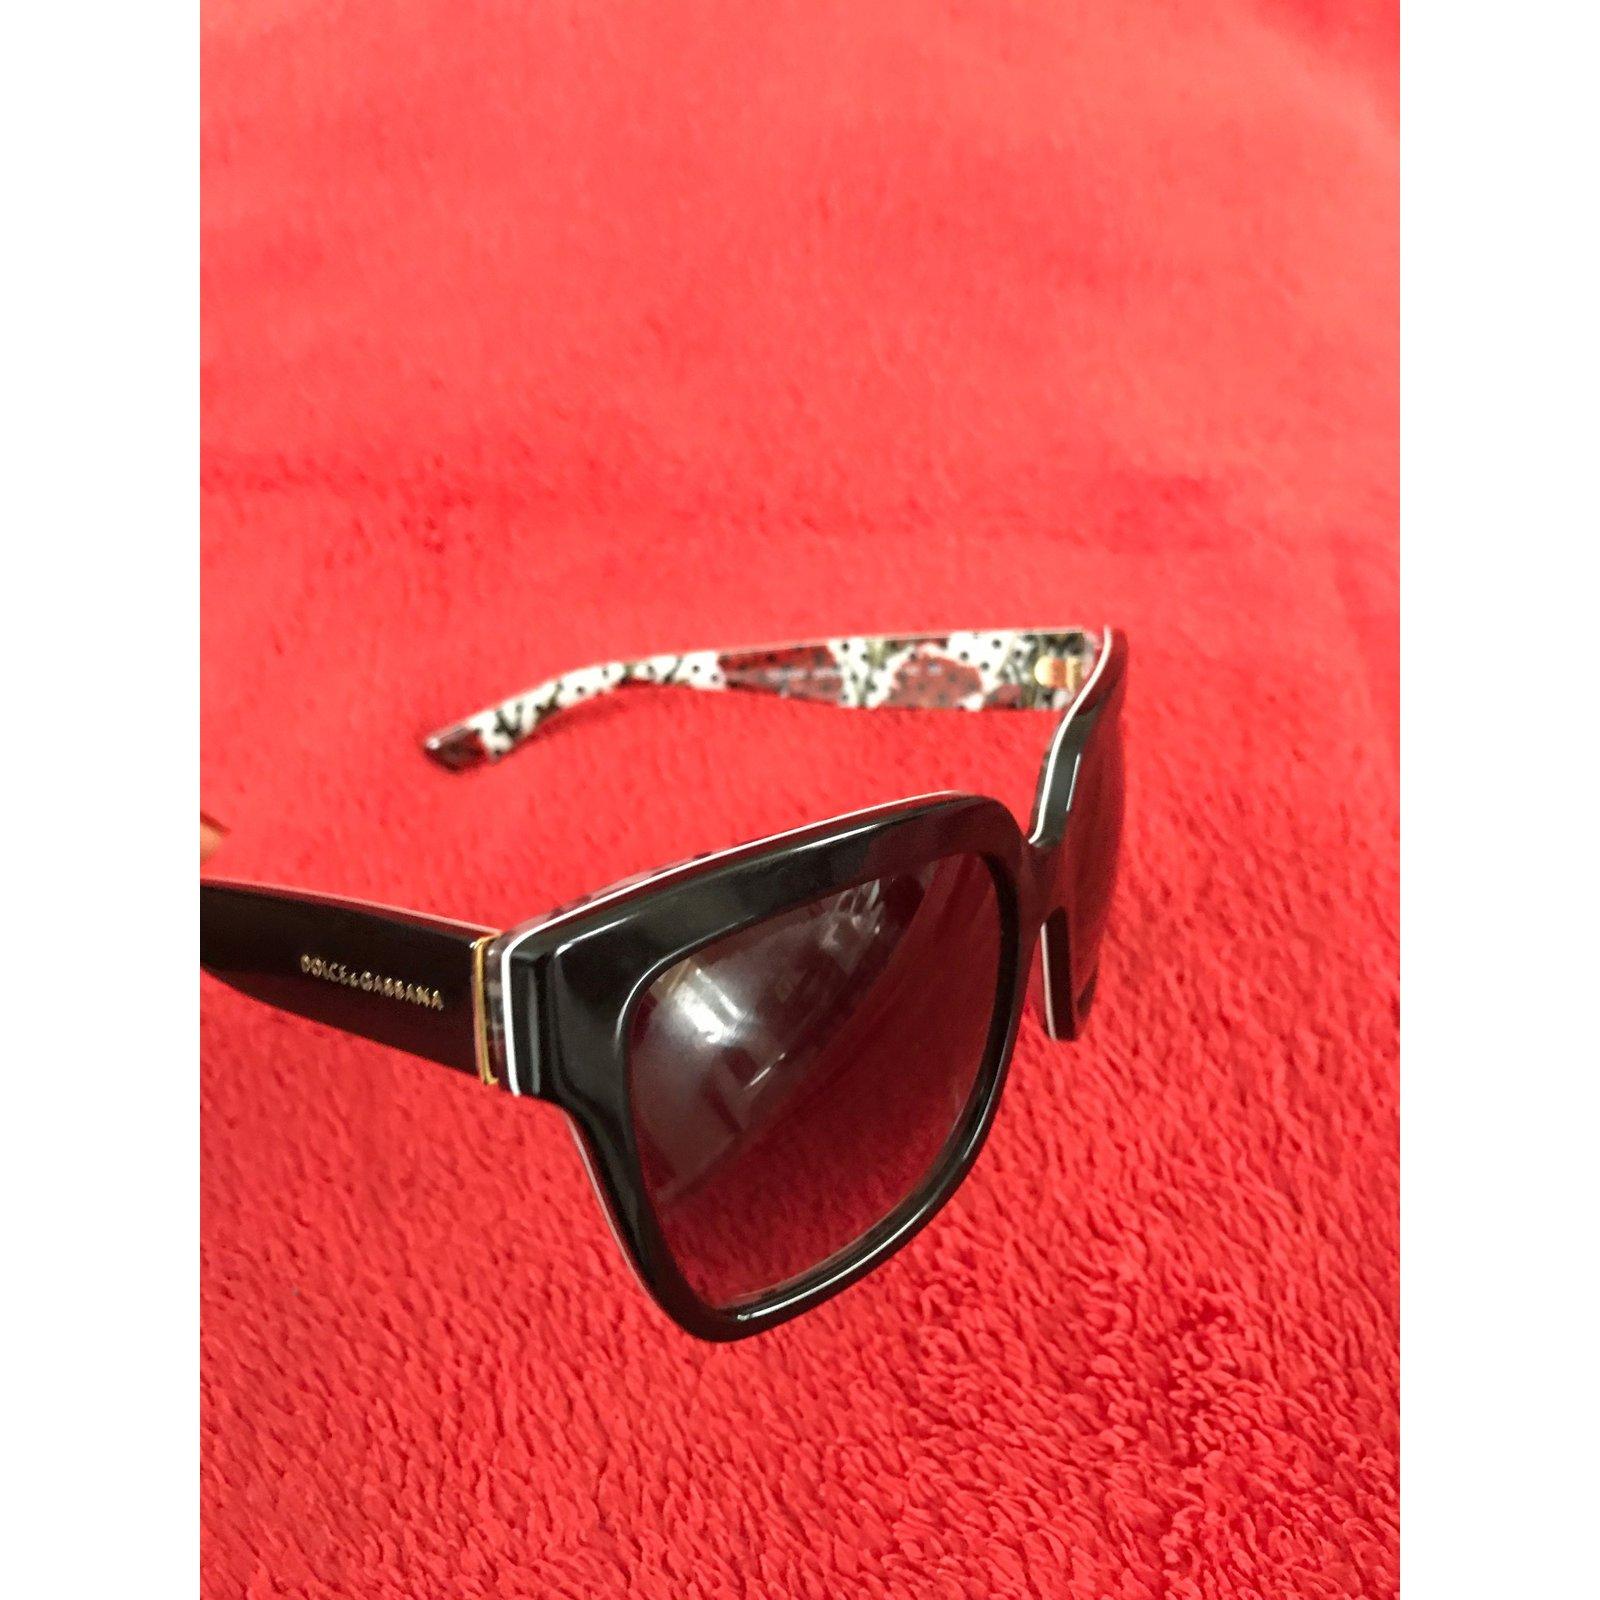 aaf004985f8d Dolce & Gabbana Dolce & Gabbana Limited Edition DG4234 Sunglasses  Sunglasses Plastic Black,Multiple colors ref.61449 - Joli Closet